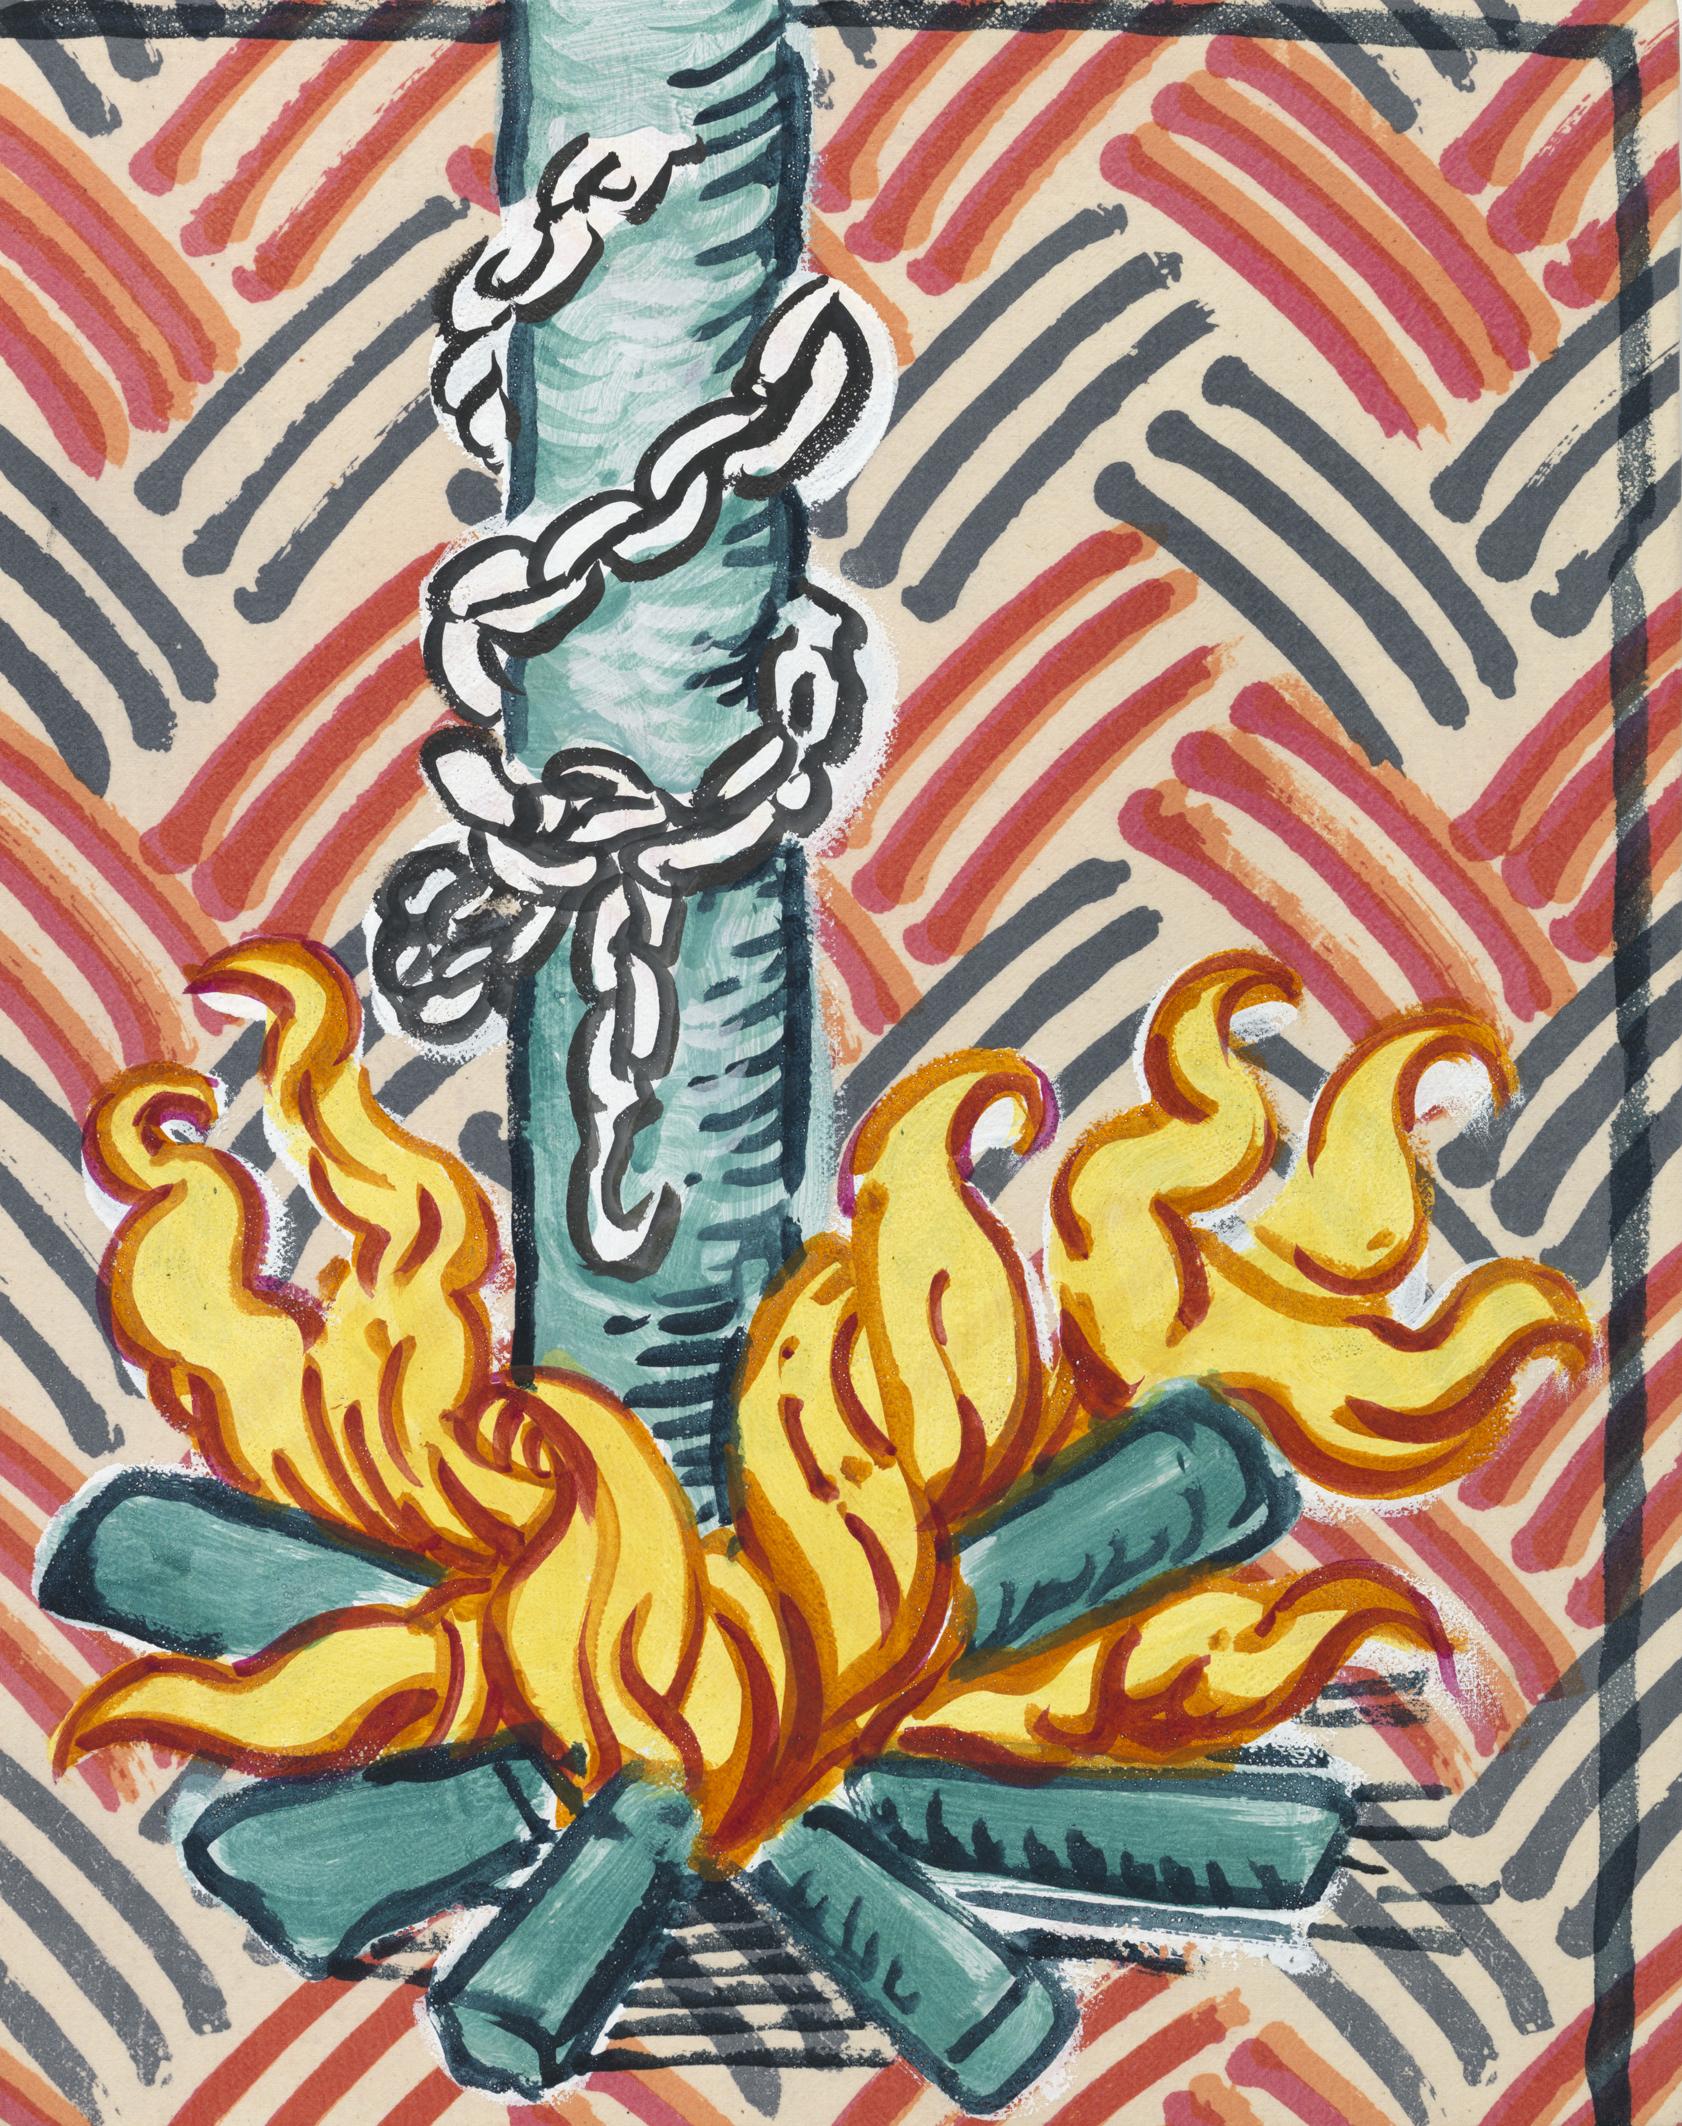 Instrument of torture: Fire, 2017